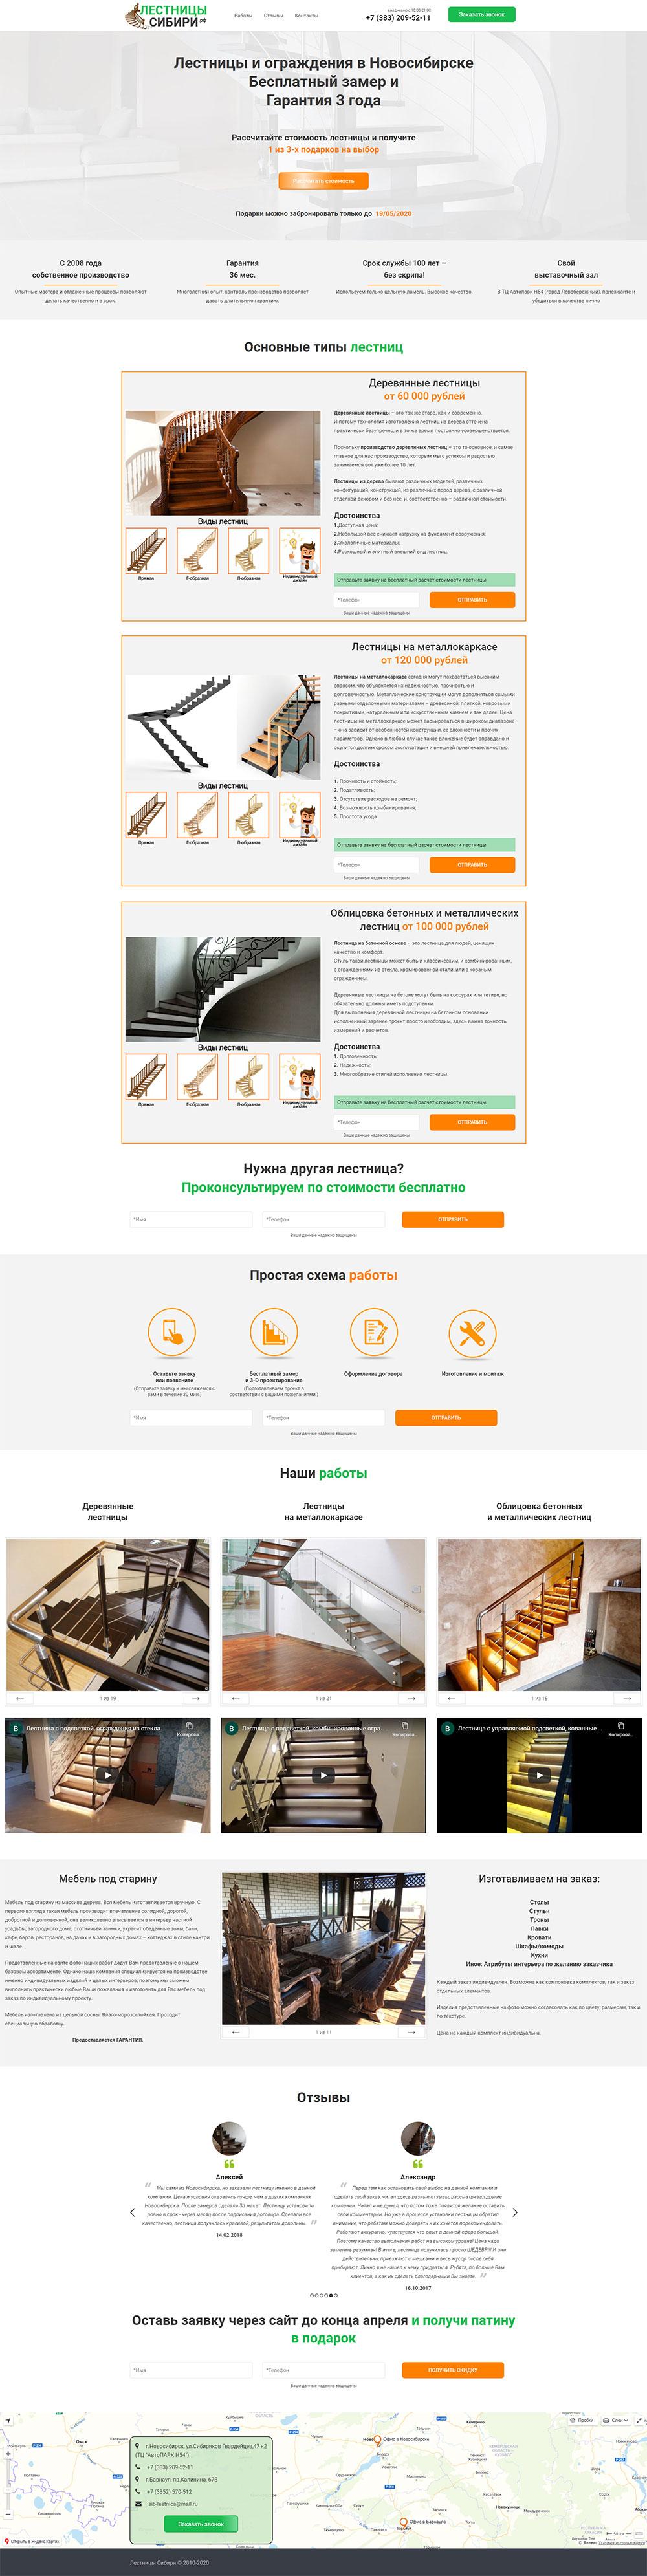 Создание лендинга Лестницы Сибири